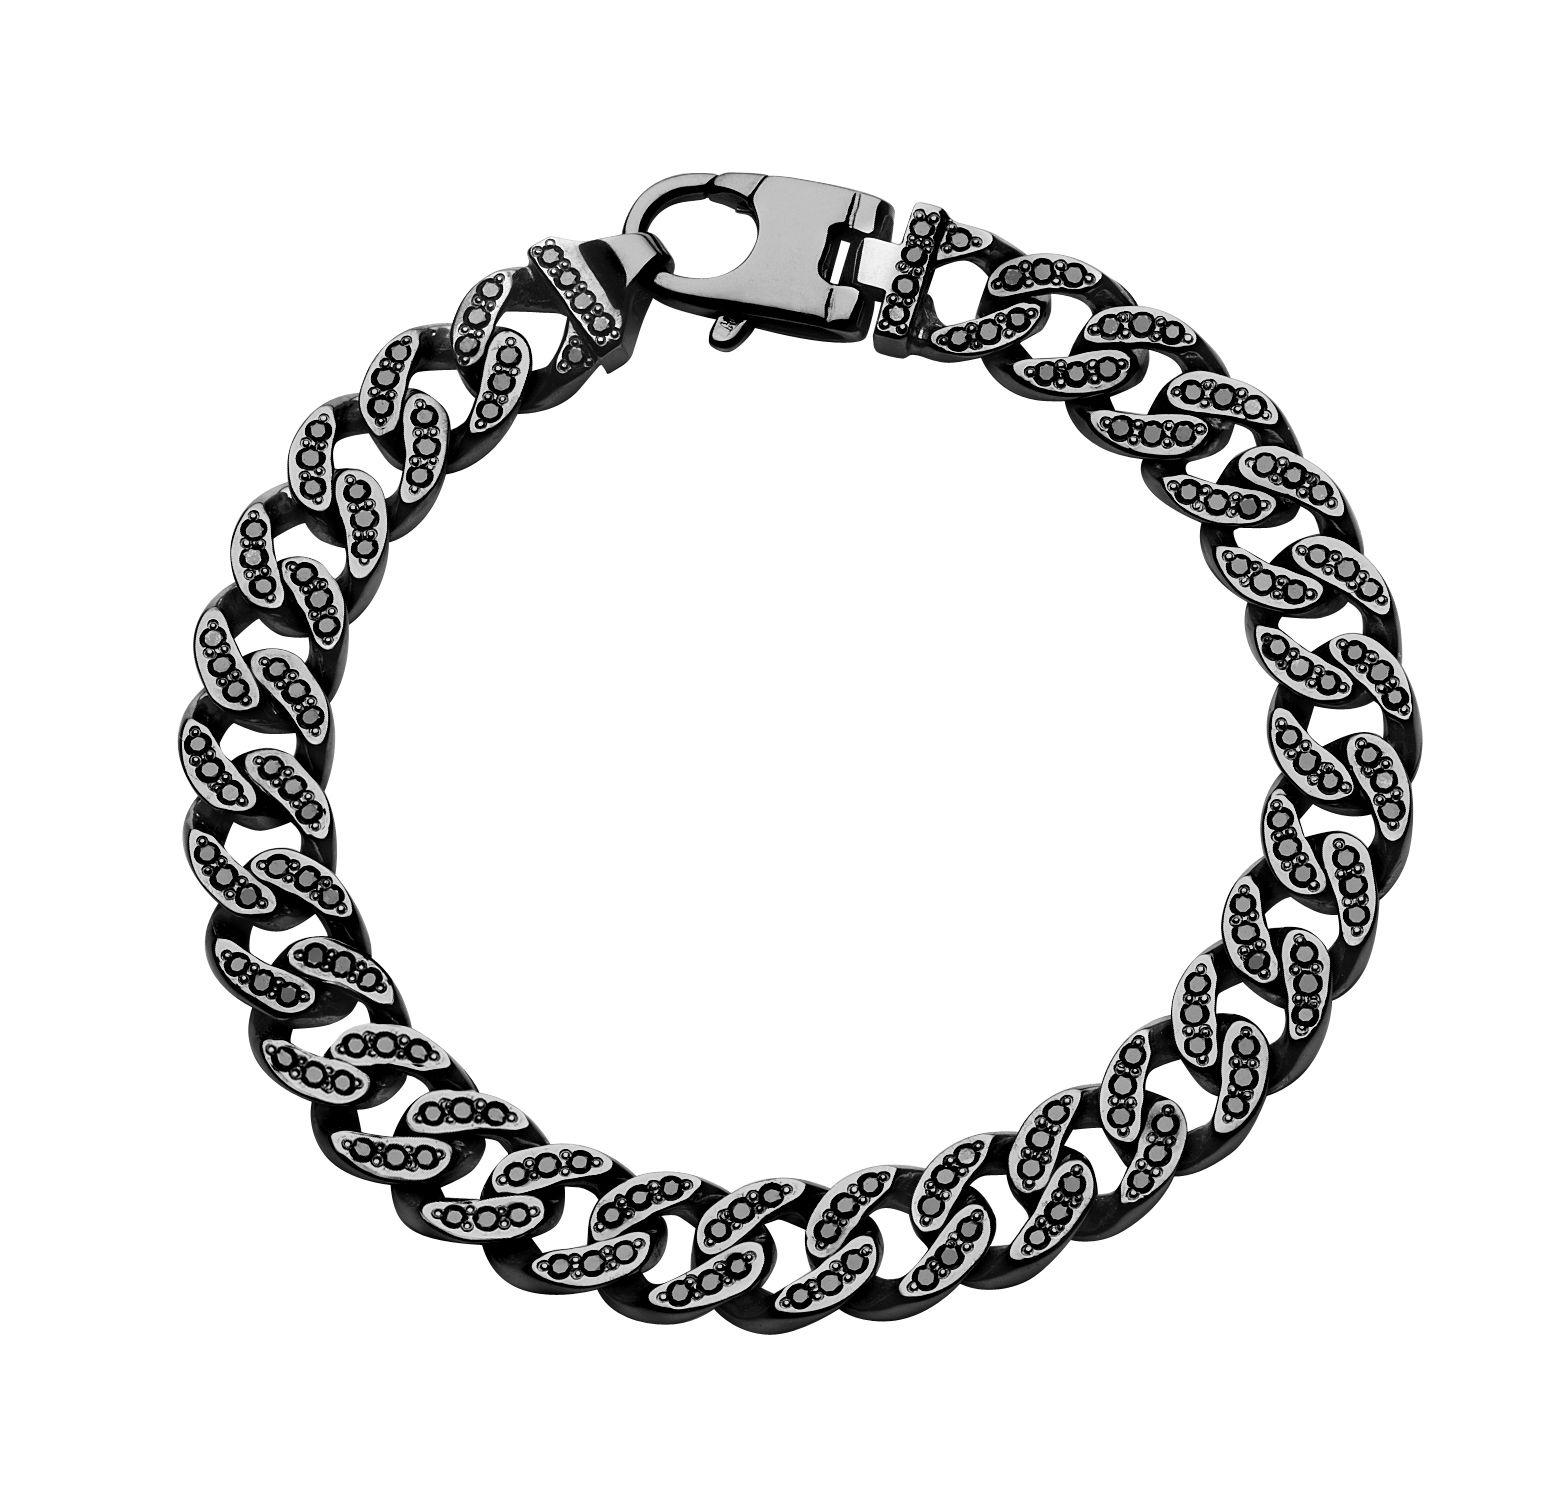 Black Diamond Bracelet http://lyonfinejewelry.mybigcommerce.com/products/Bedford.html